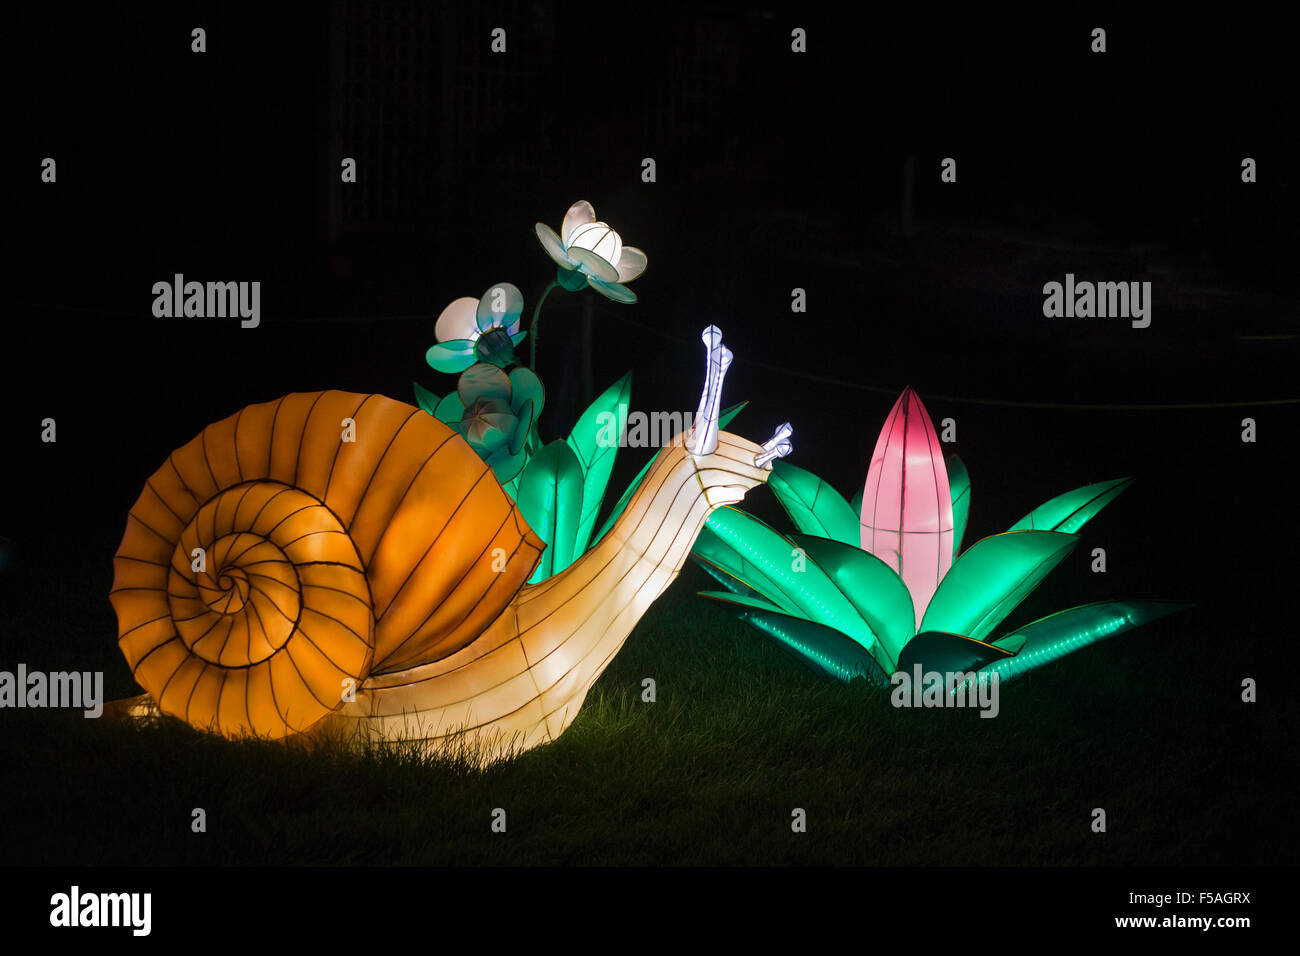 Snail lantern at the Illuminasia Lantern Festival, handmade by Chinese artisans,  powered by energy efficient LED - Stock Image